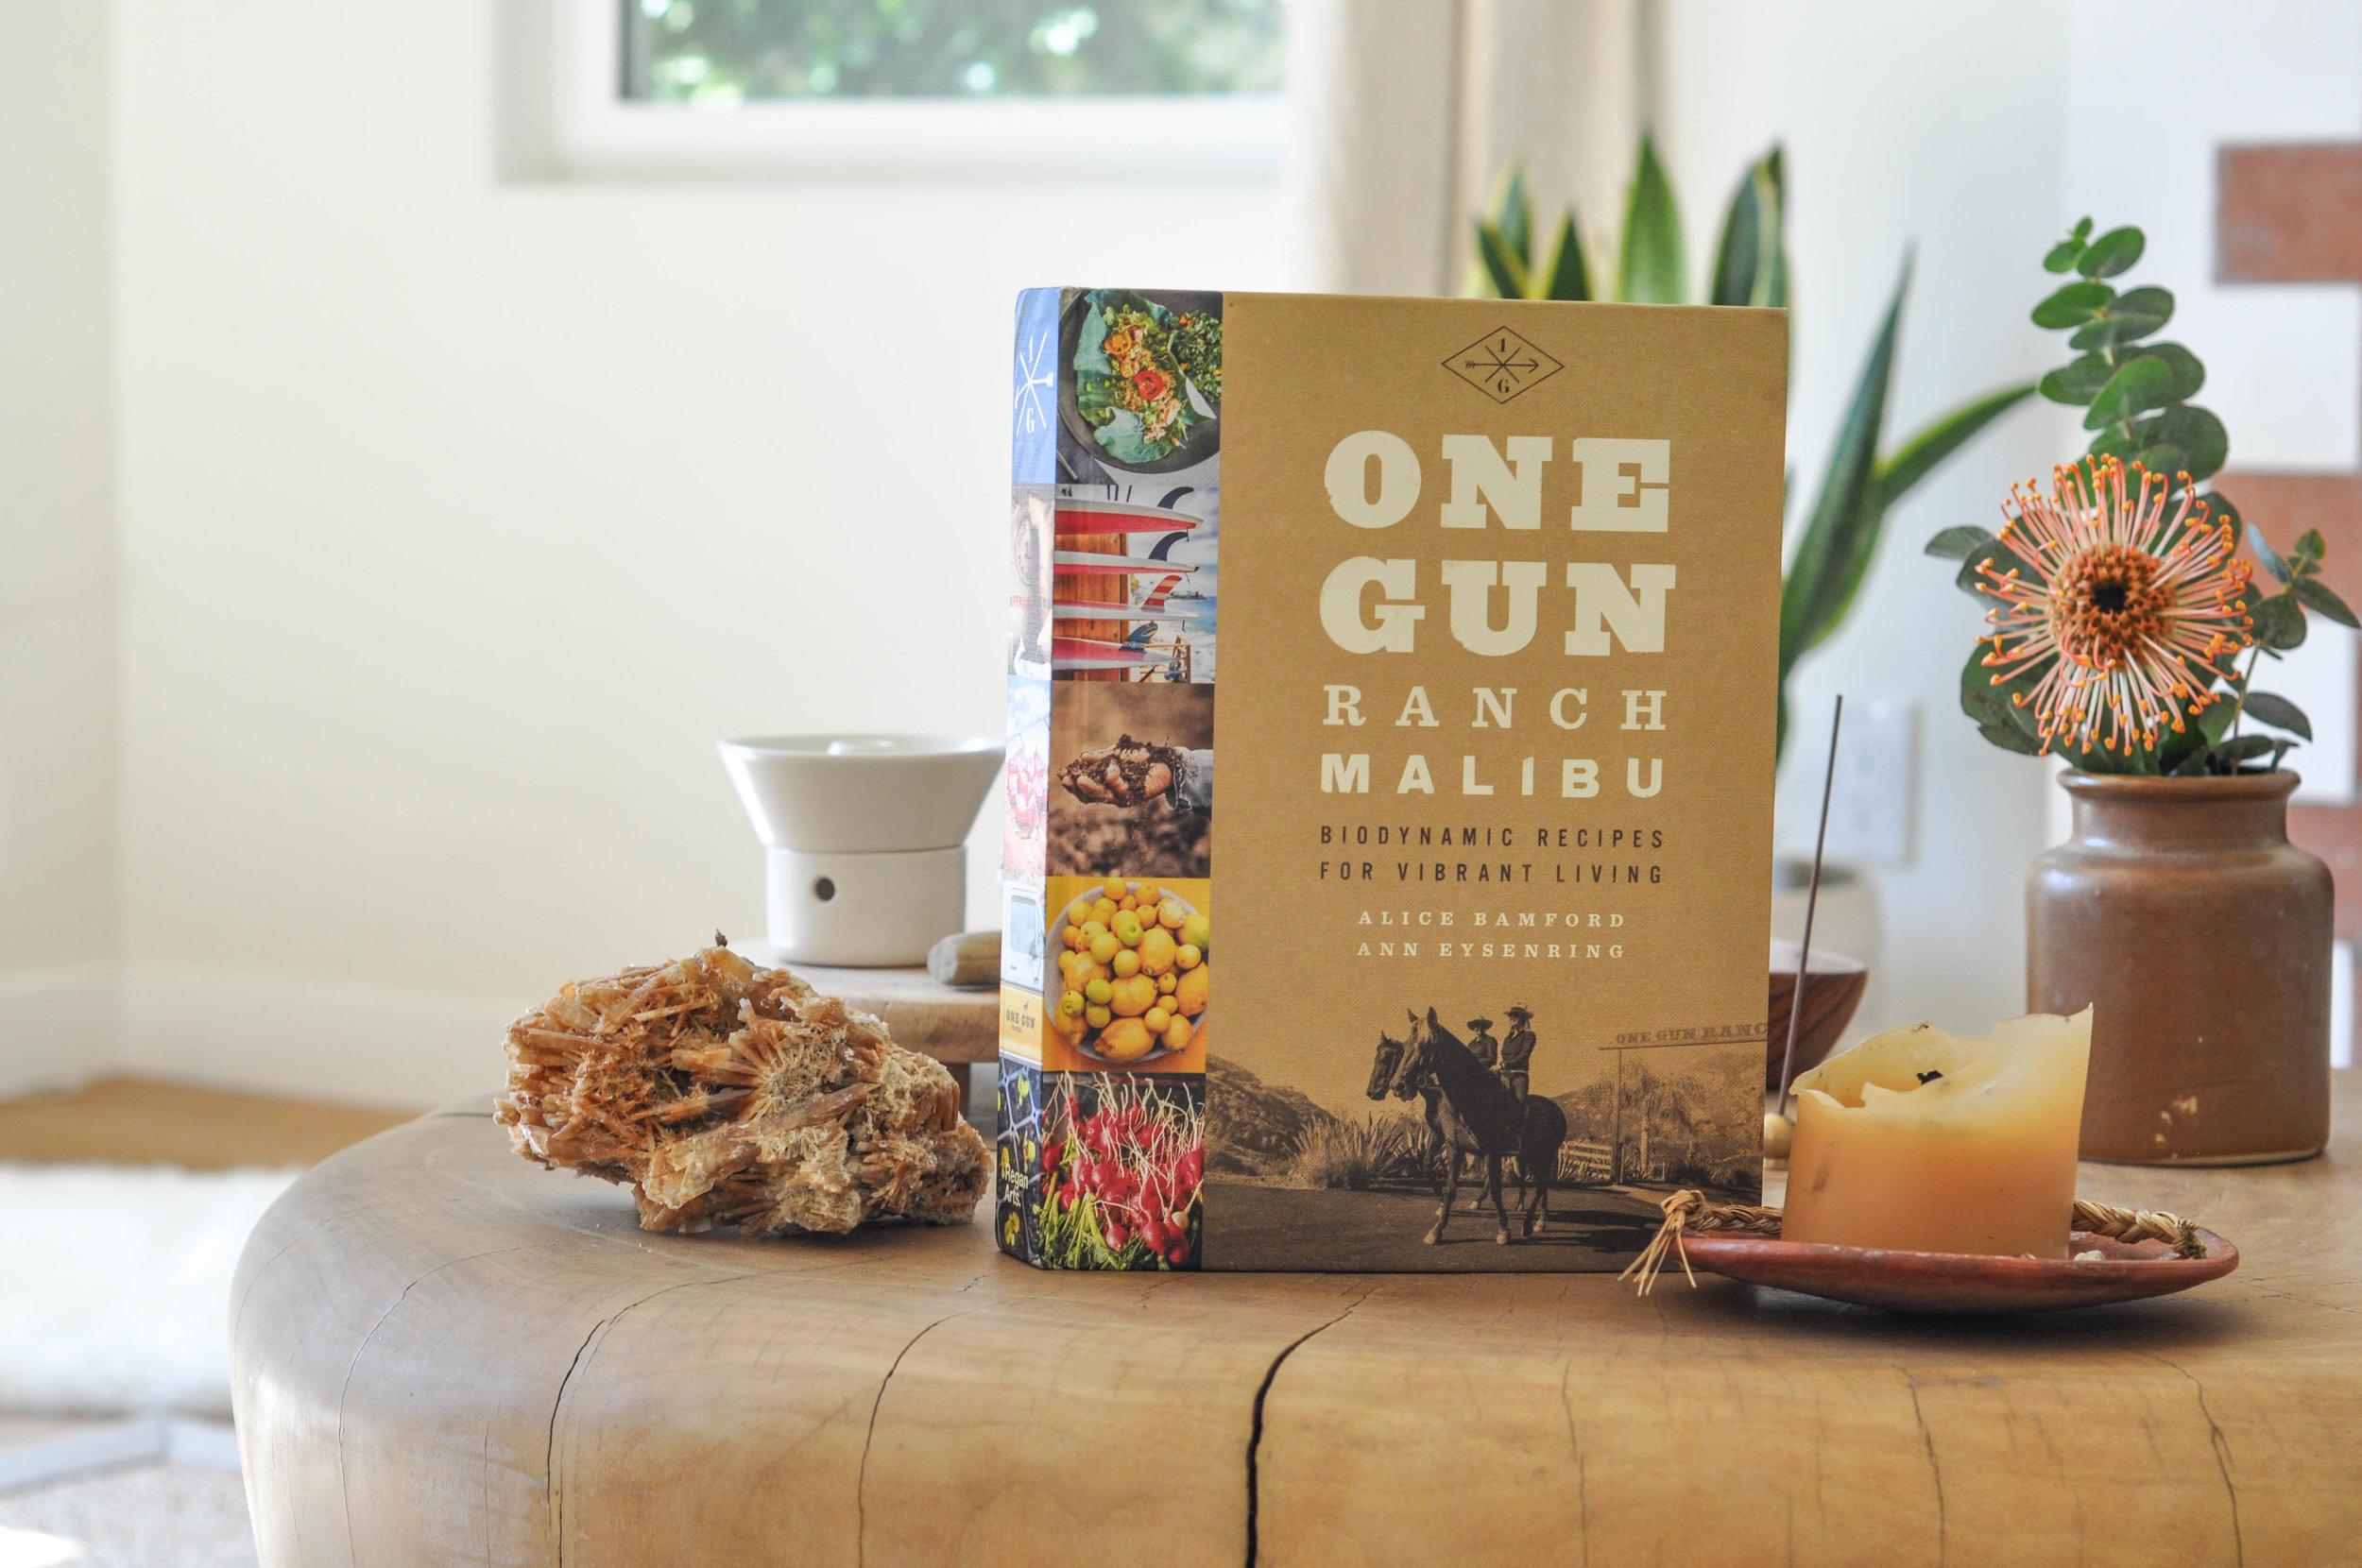 free-and-native-One Gun Ranch Malibu